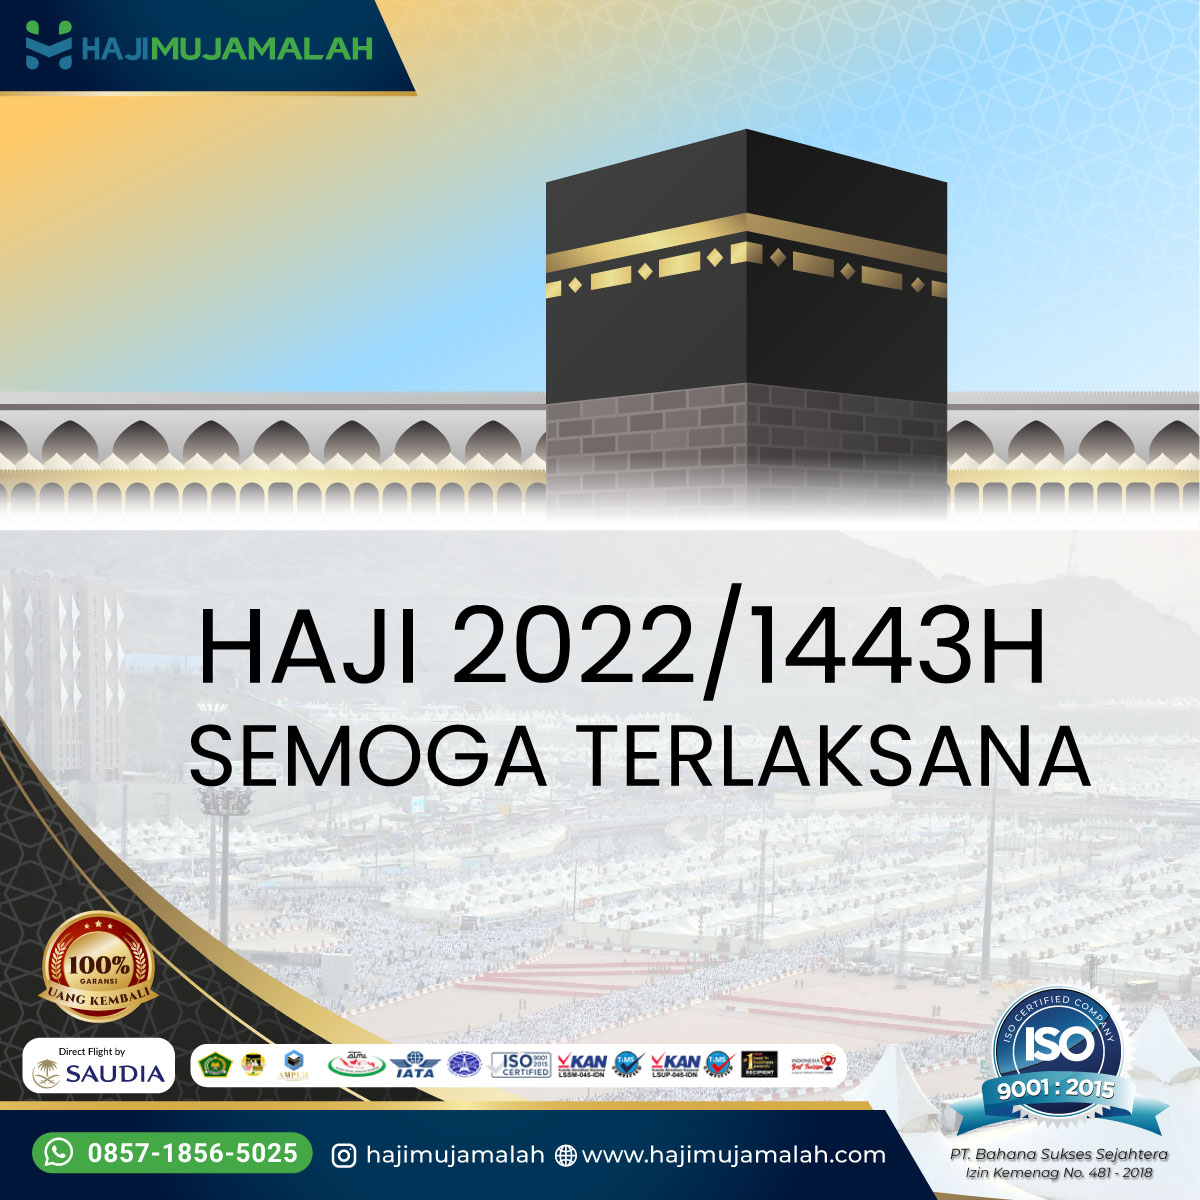 Apakah Haji 2022 Akan Dilaksanakan? Semoga Alhamdulillah